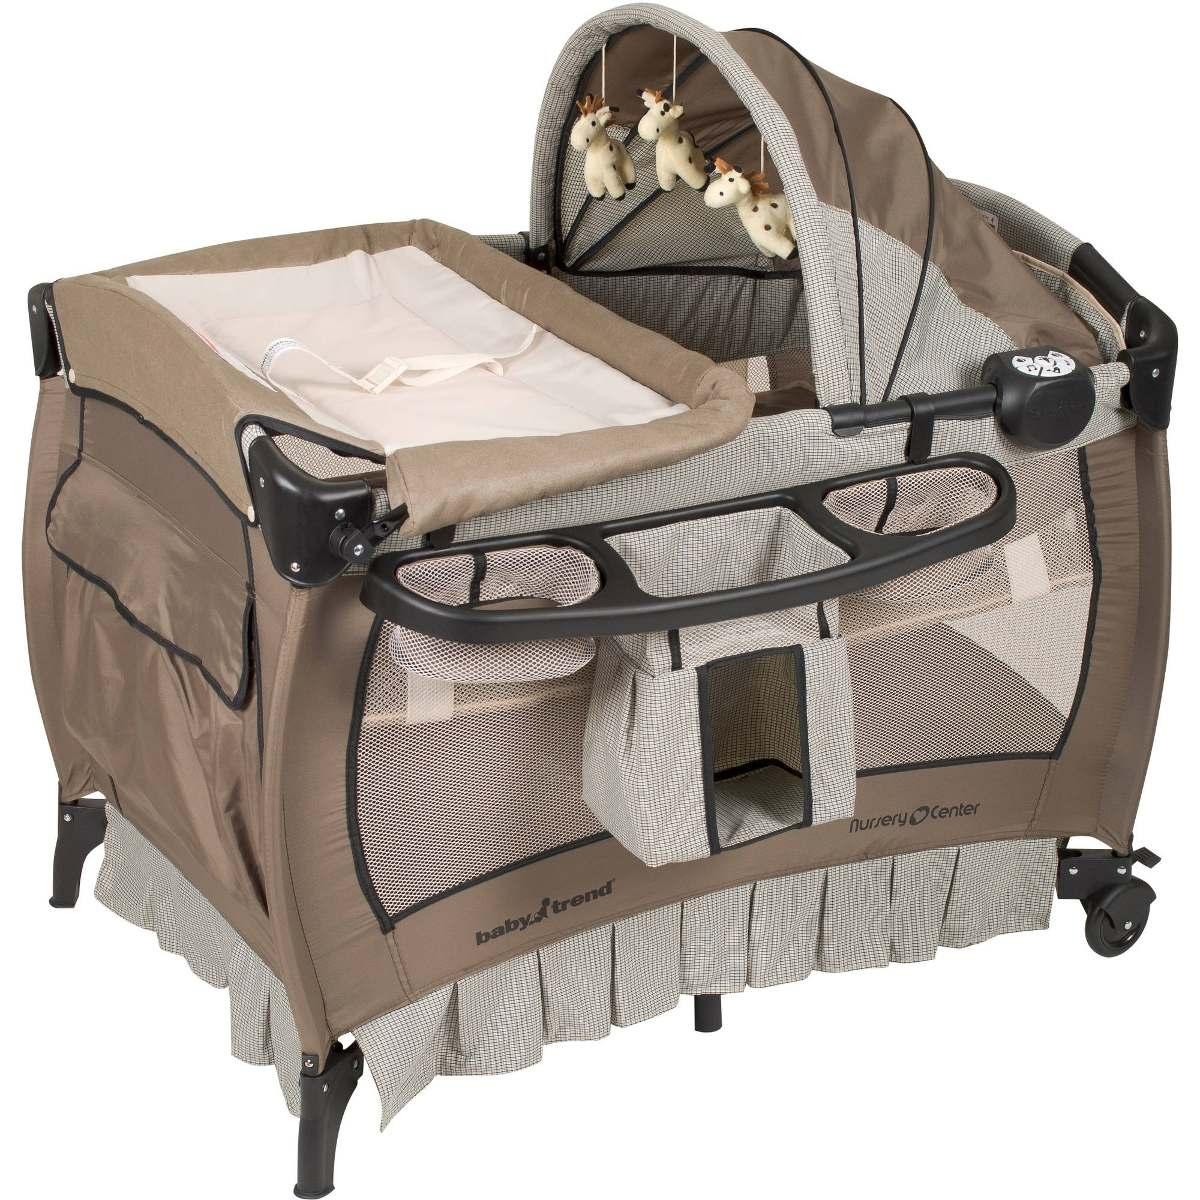 Cuna Corralito Baby Trend Cambiador Vibracion Musica Luz